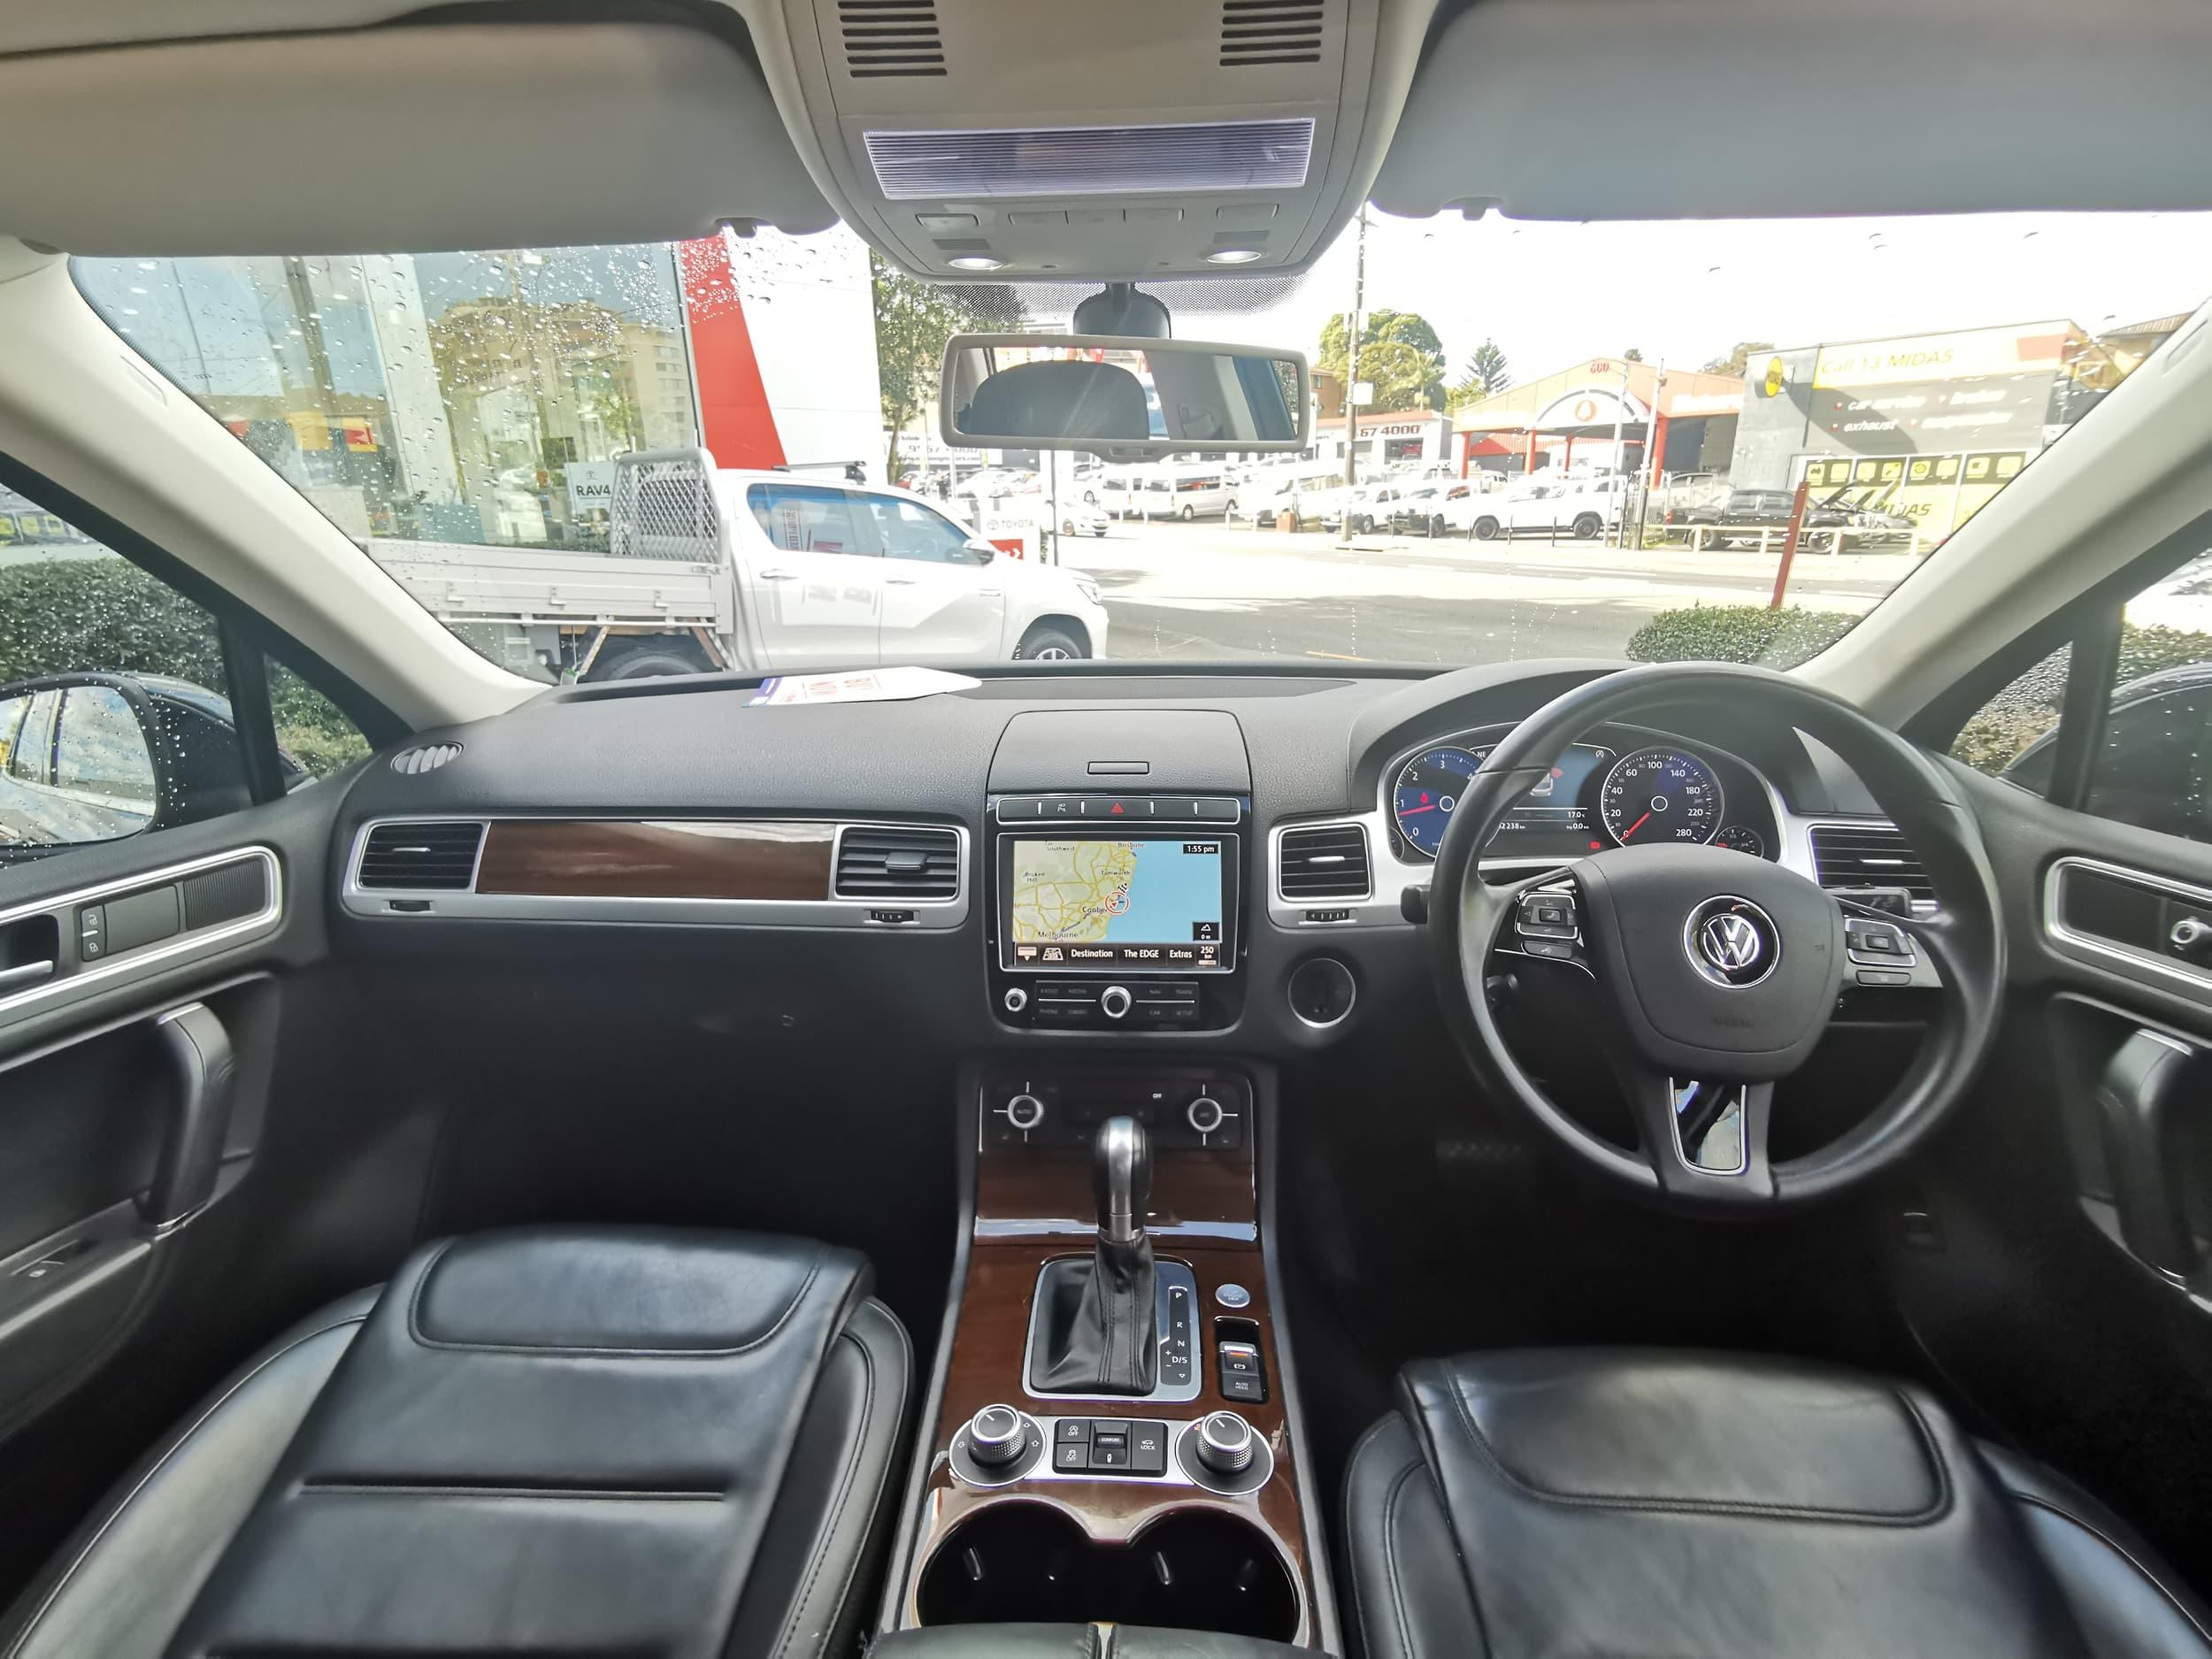 2015 Volkswagen Touareg V6 TDI 7P Auto 4MOTION MY16 - image 17